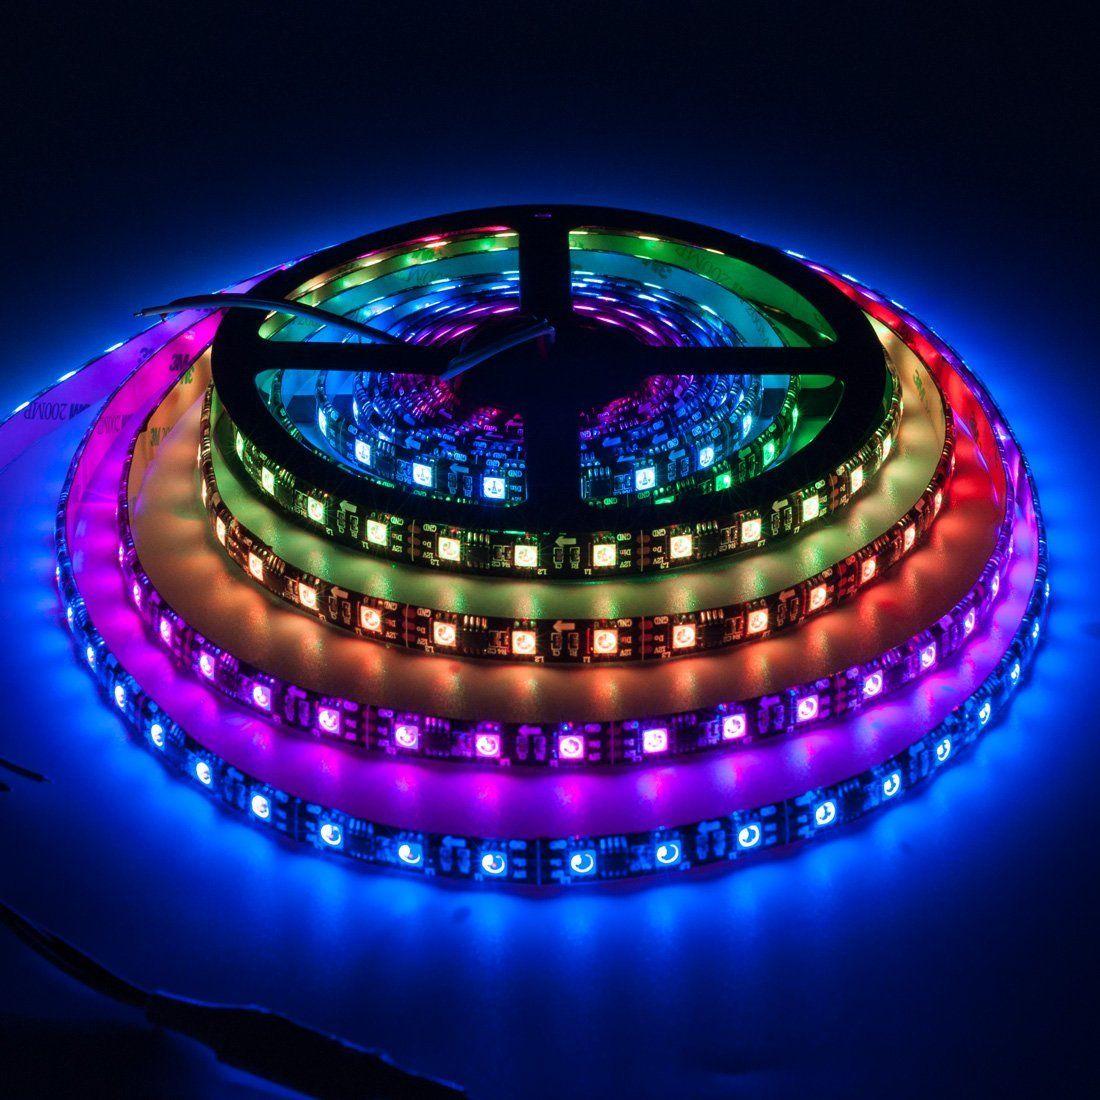 Amazon Com Btf Lighting Ws2811 5m 16 4ft 60leds X2f Pixels X2f M 300leds Ip65 Waterproof Black Pcb Flexible Addressable Strip L Strip Lighting Rgb Led Light